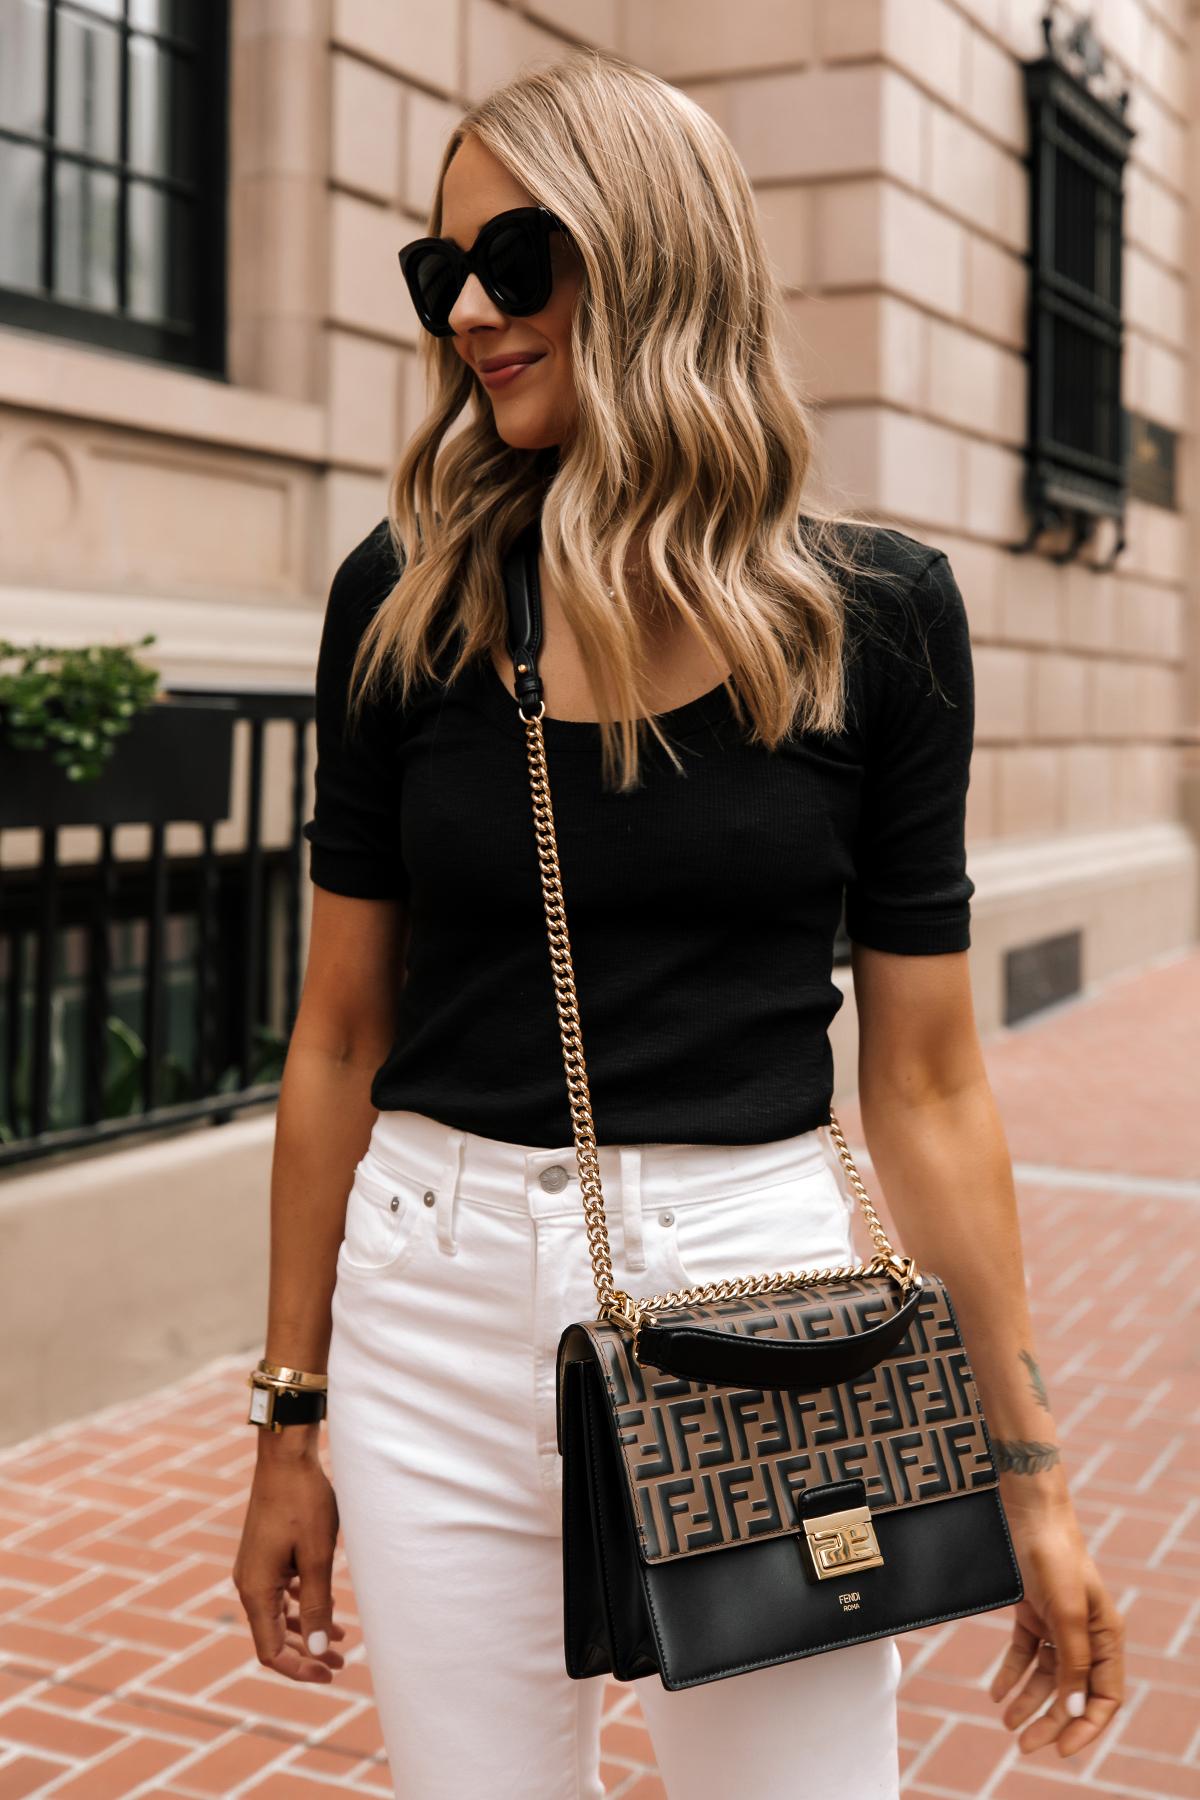 Fashion Jackson Wearing Black Scoop Neck Top White Jeans Fendi Ken U Medium Shoulder Bag